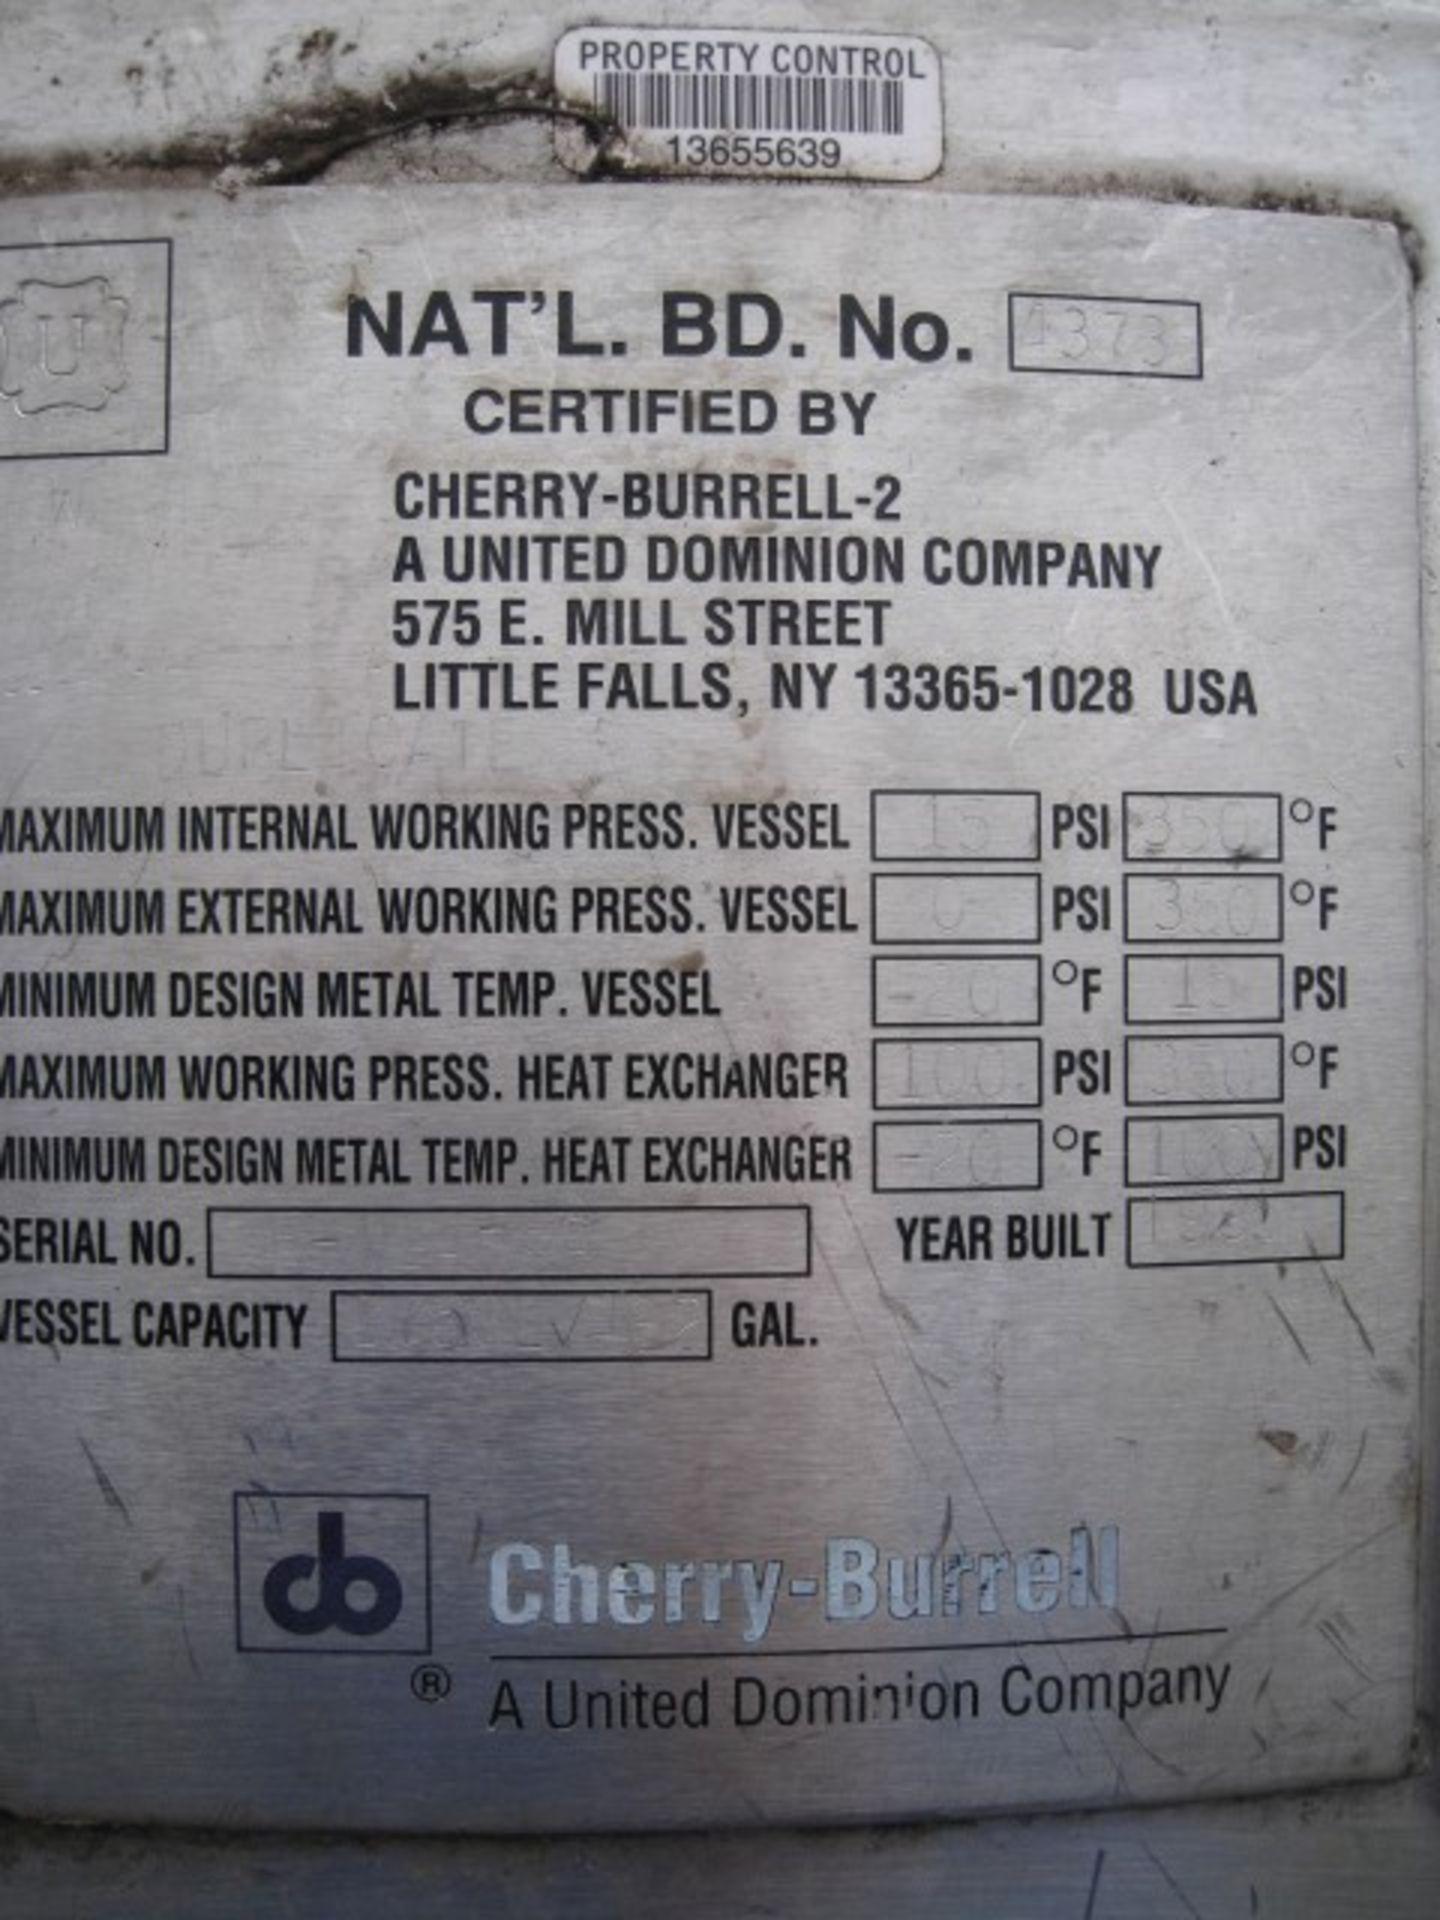 Lot 10 - 1750 Liter (462 gallon) Cherry-Burrell reactor, 316L stainless steel construction